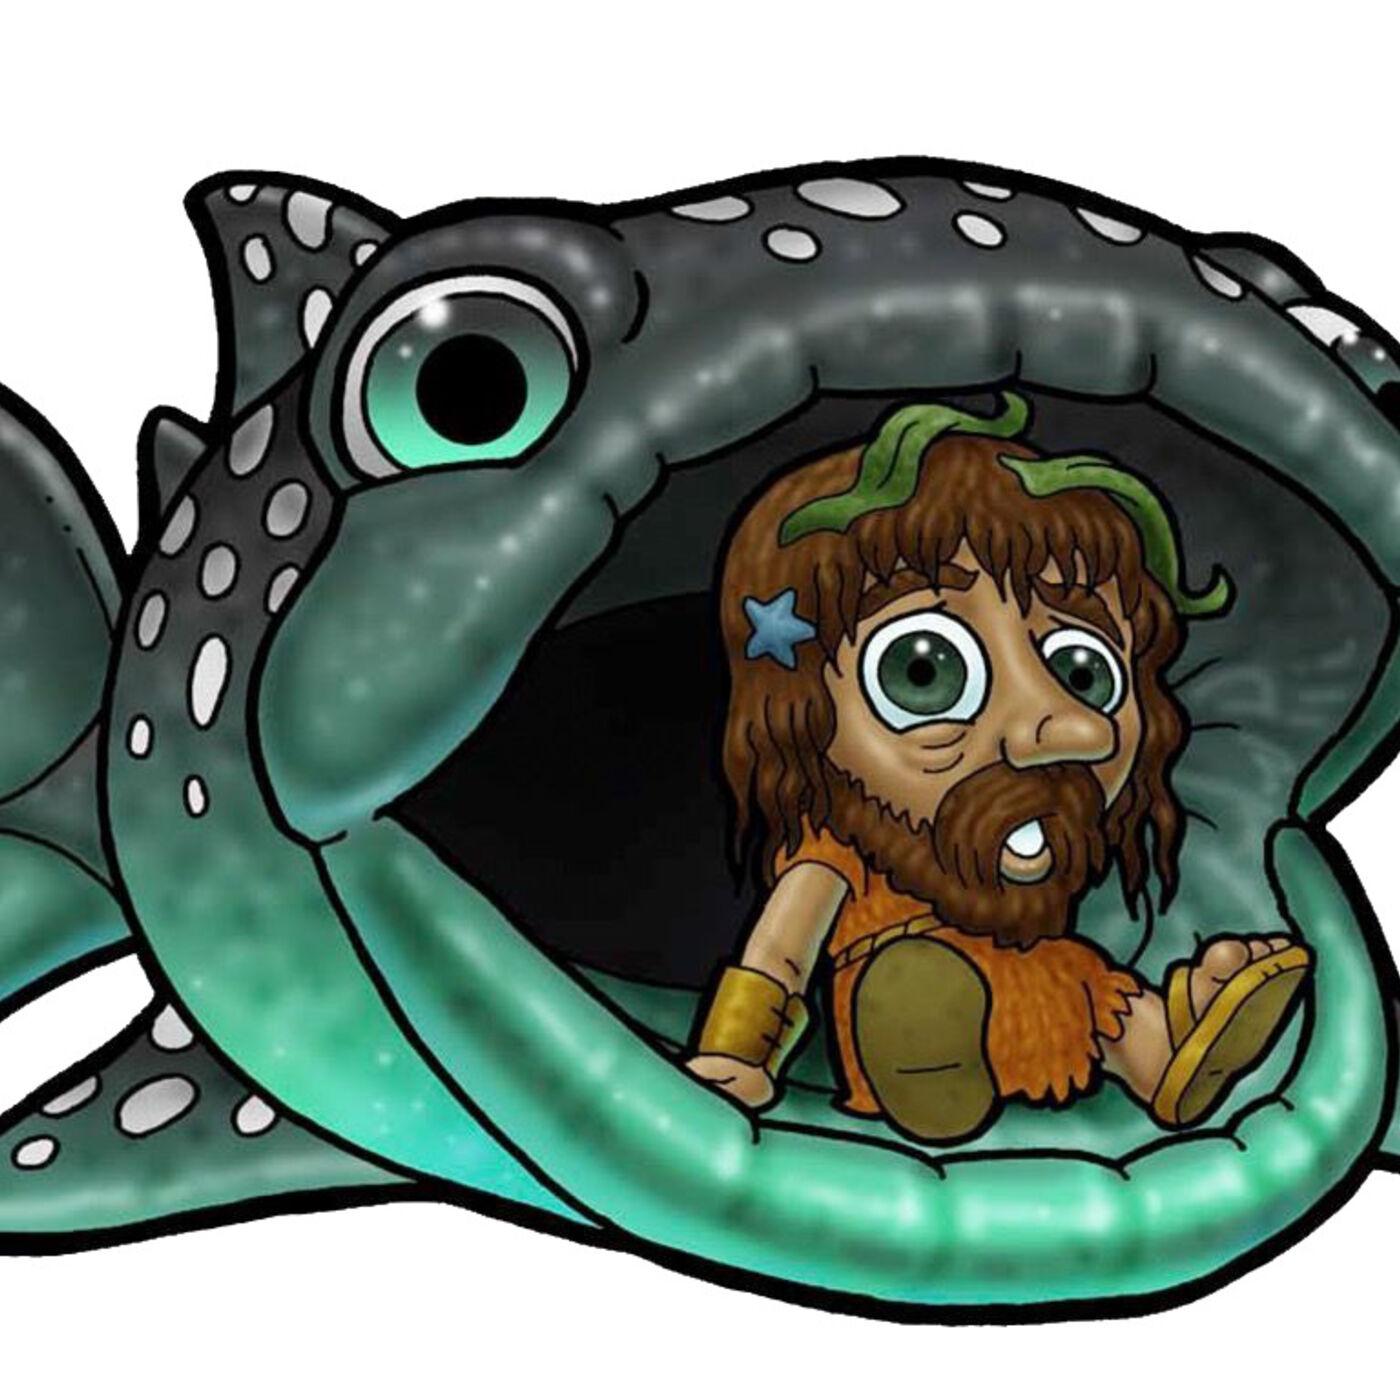 Lies About Jonah